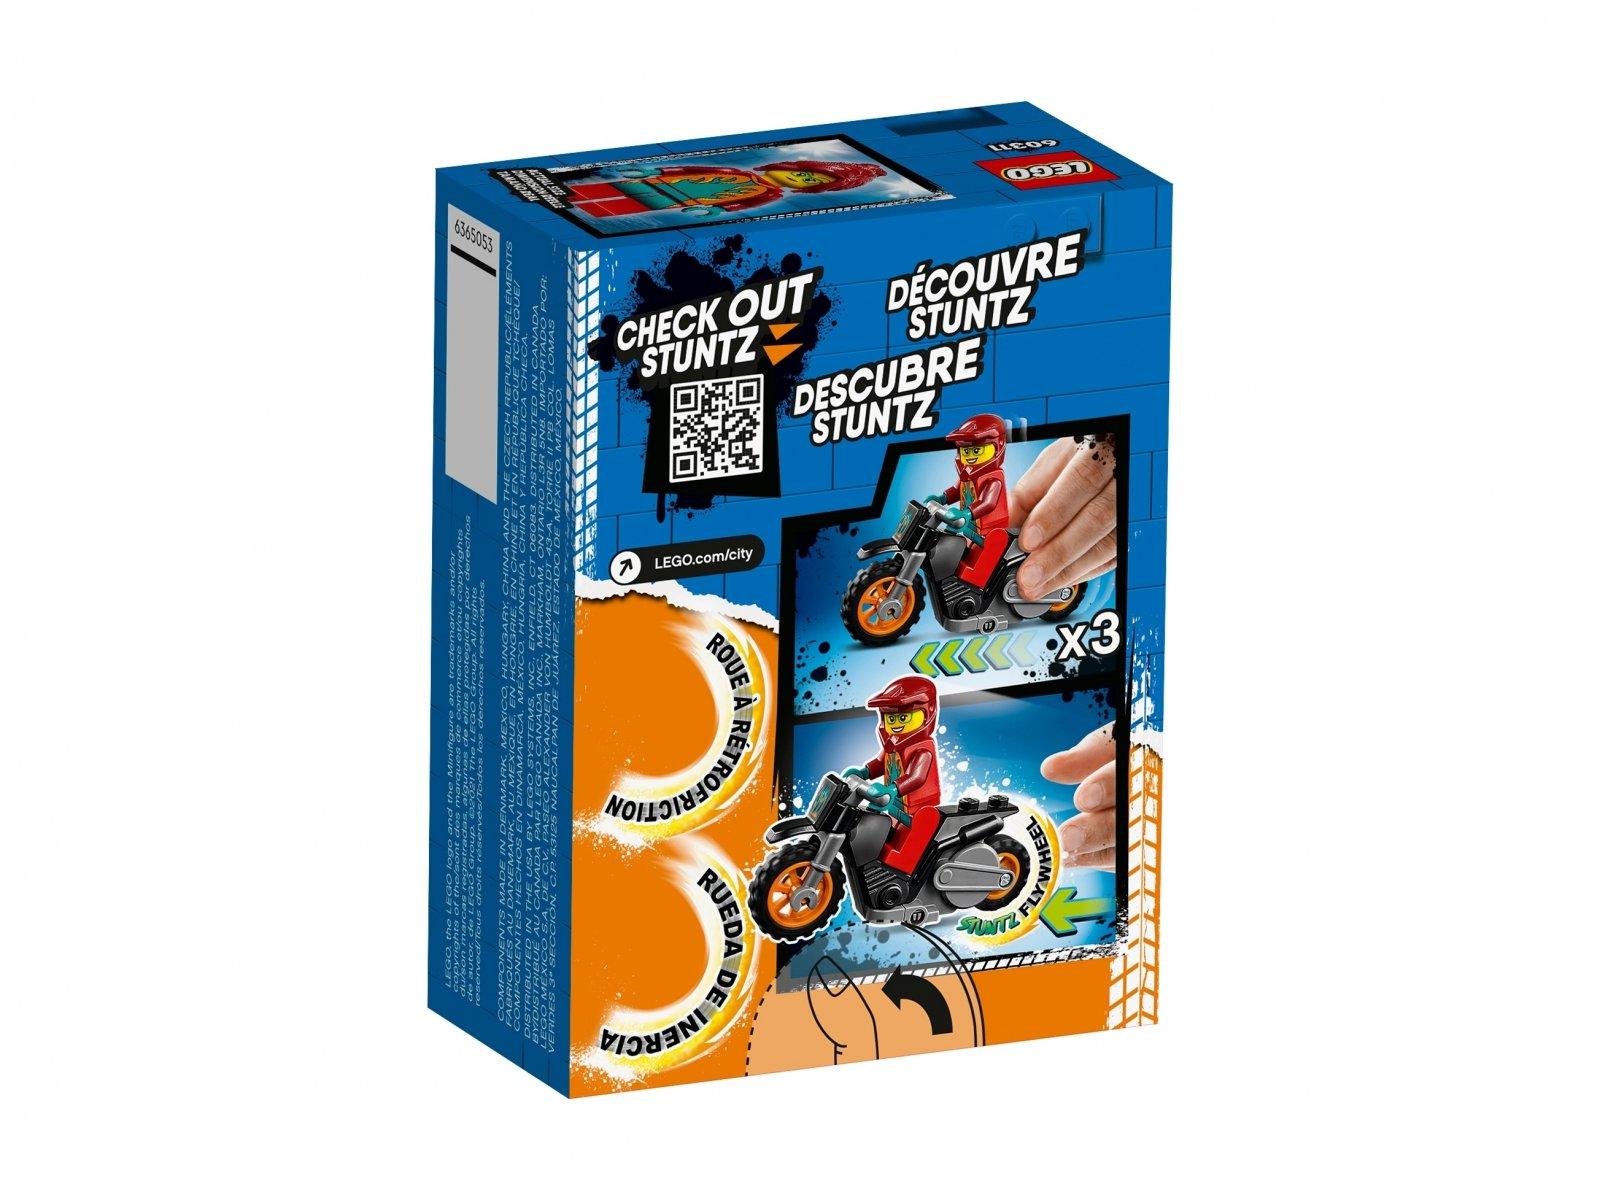 LEGO 60311 Ognisty motocykl kaskaderski